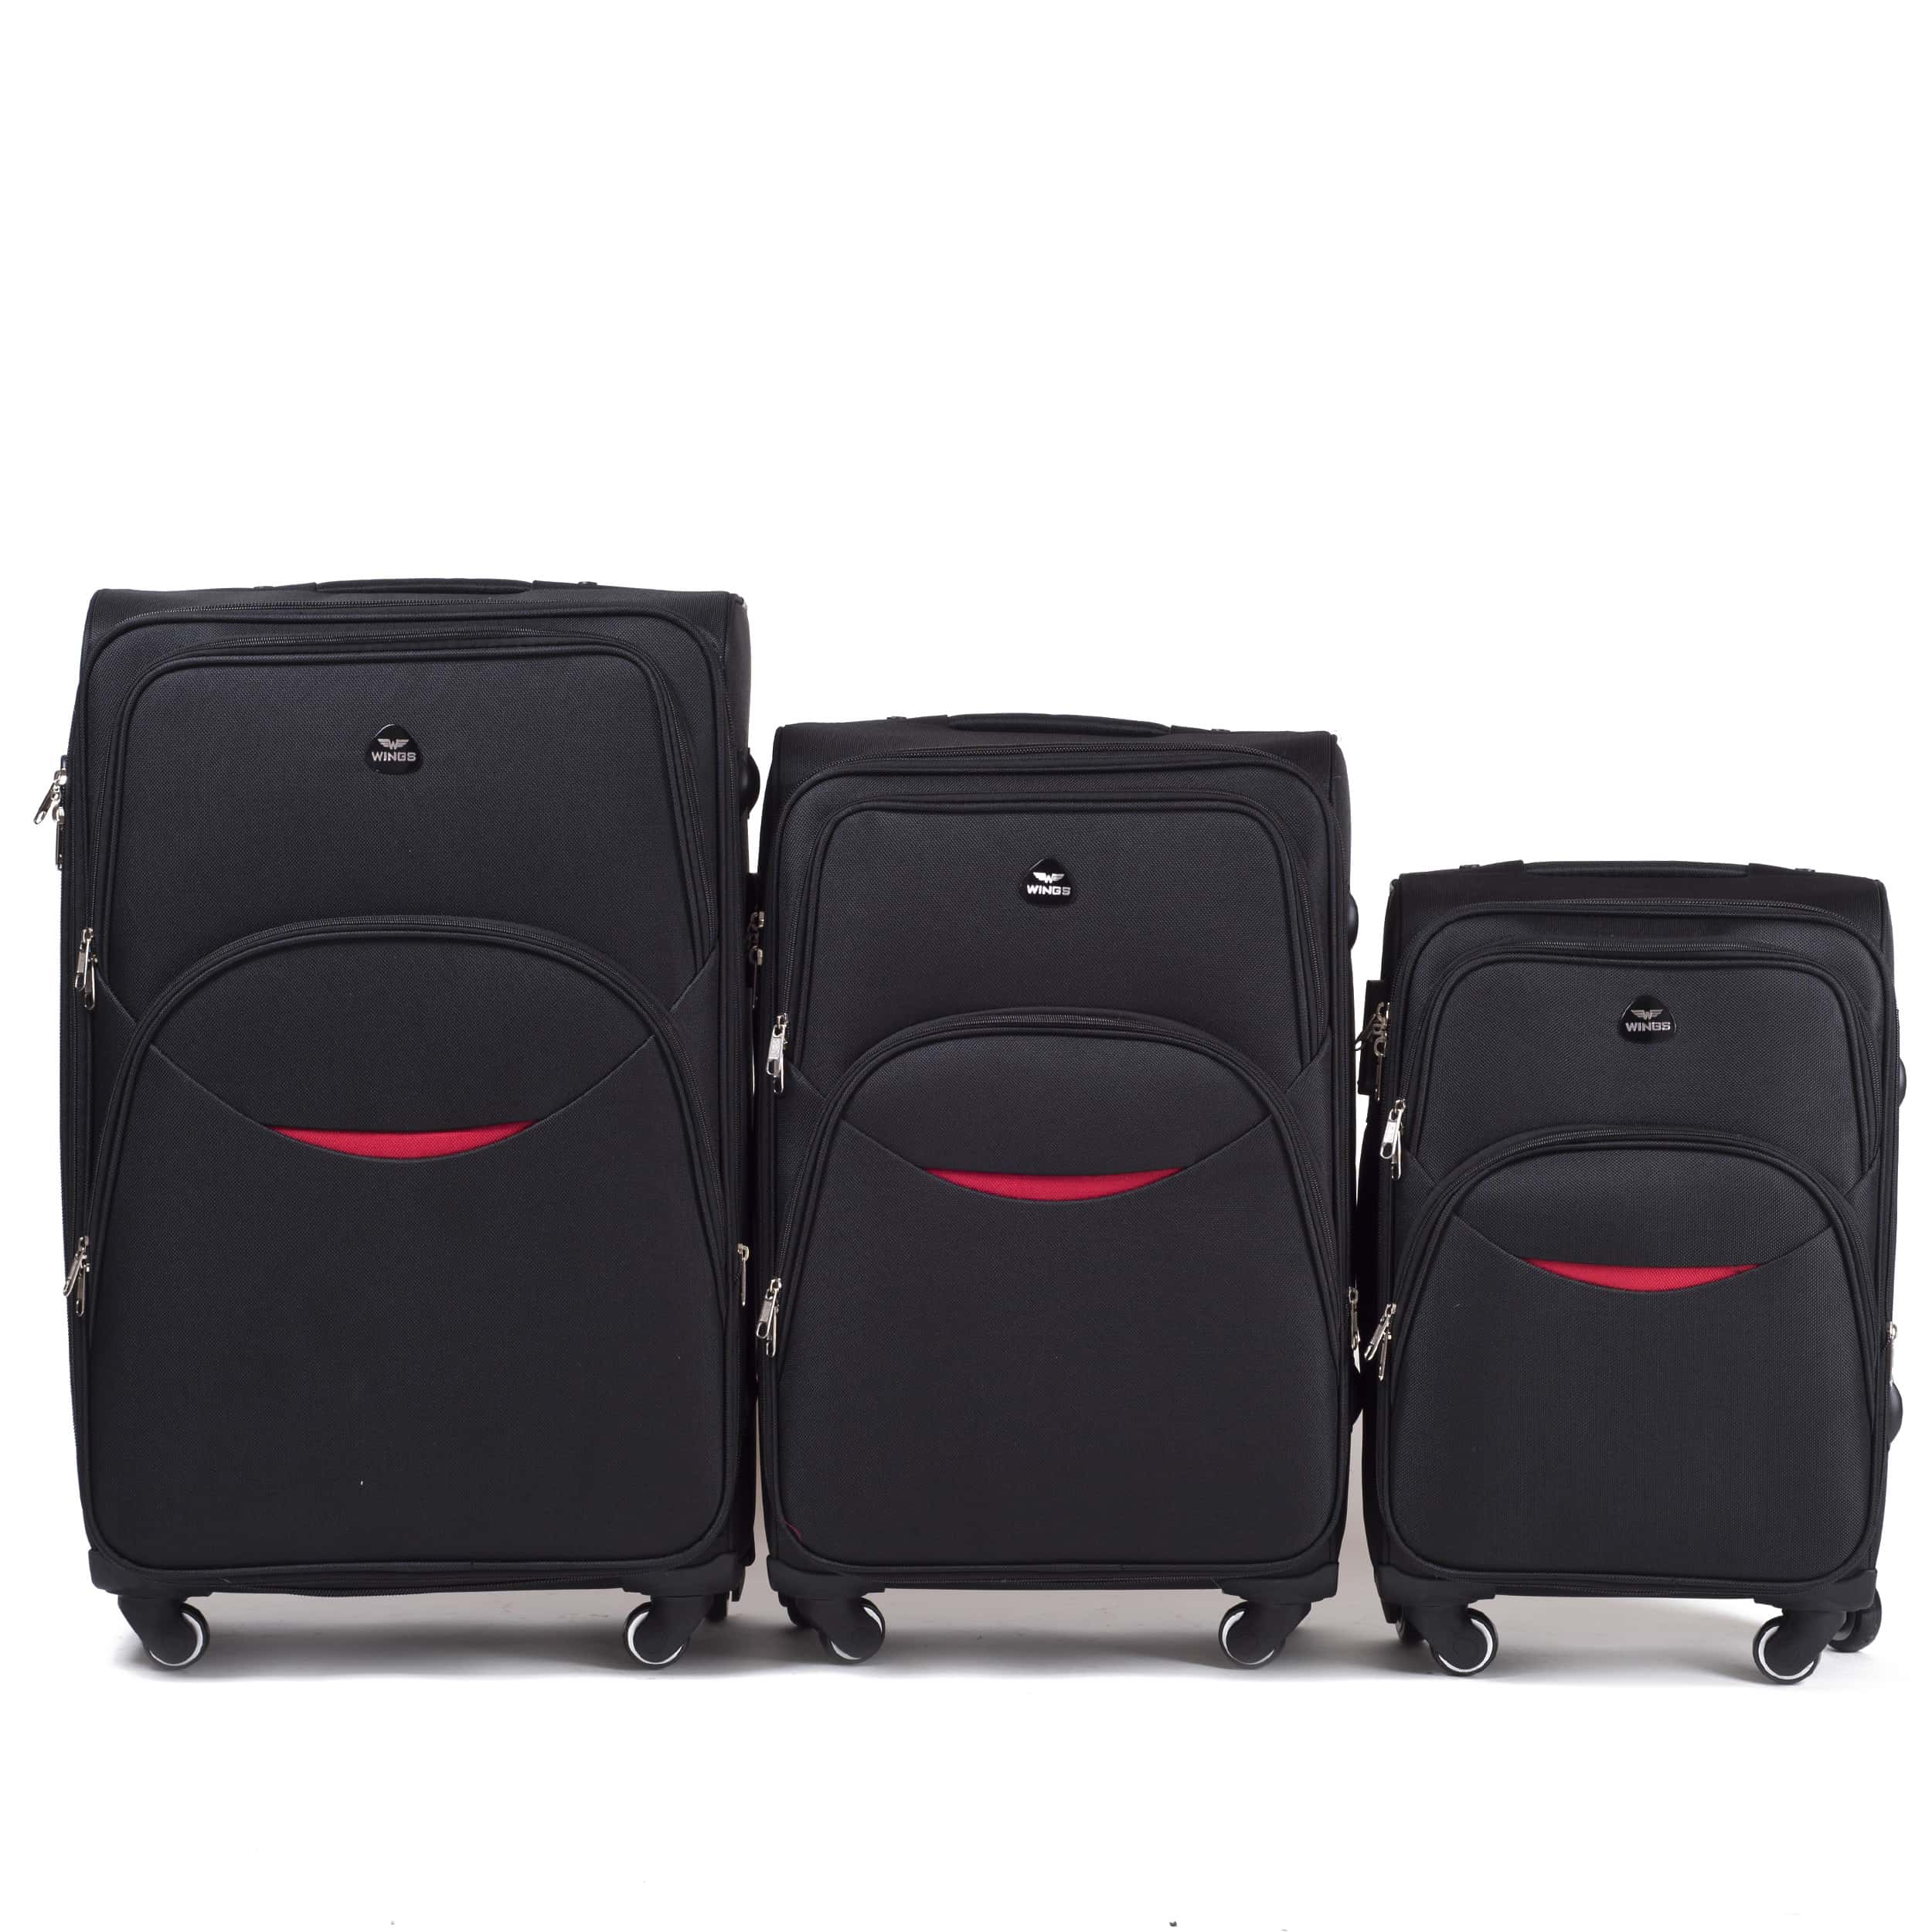 Set de valize di Textil pe 4 roti! Rezistente si usoare! 1708-4 BLACK